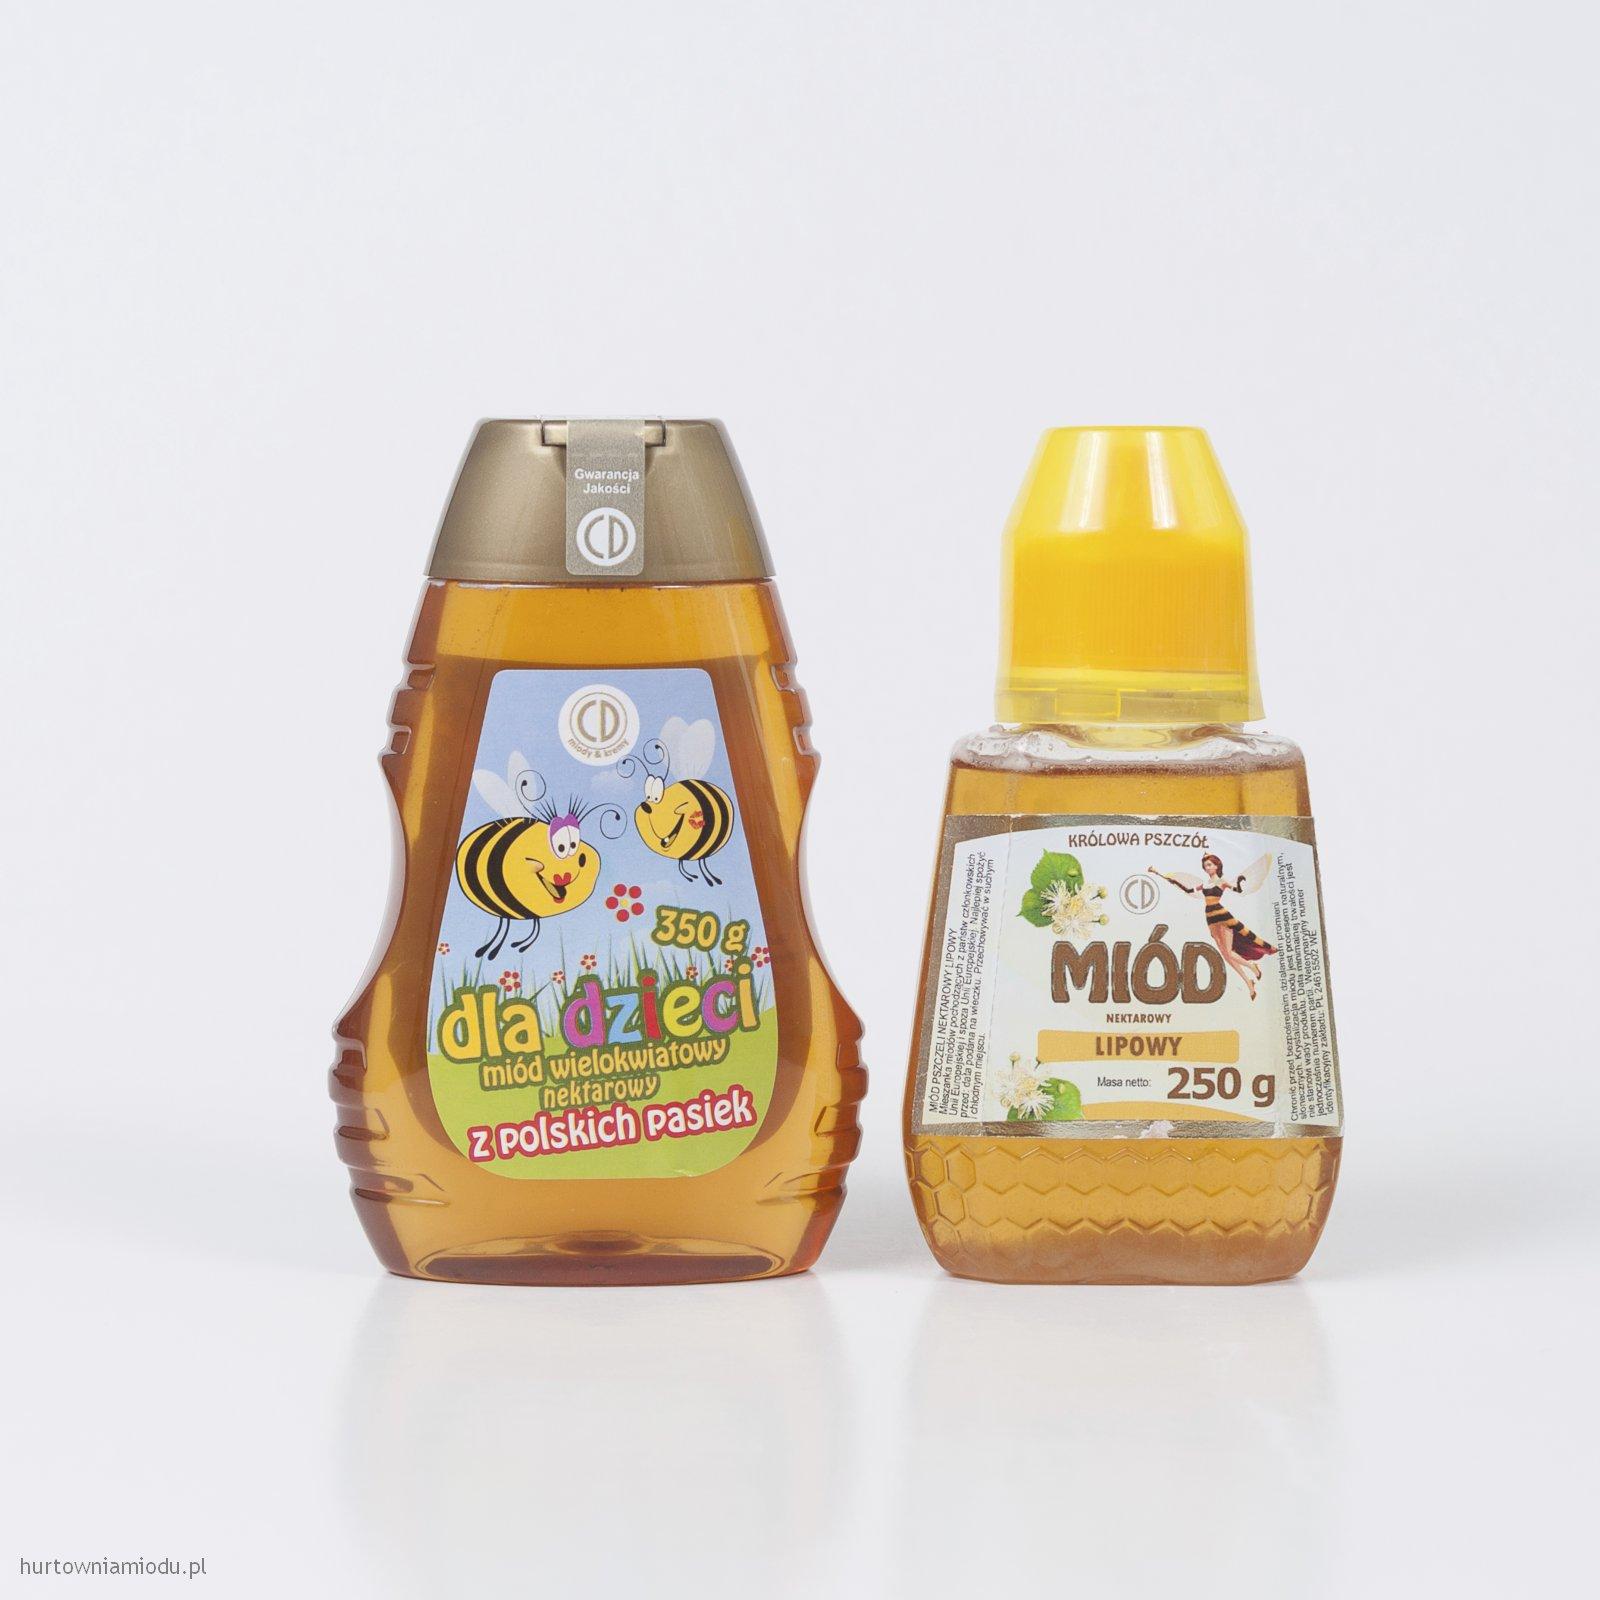 hurtownia-miodu-gdansk_ad018569hweb